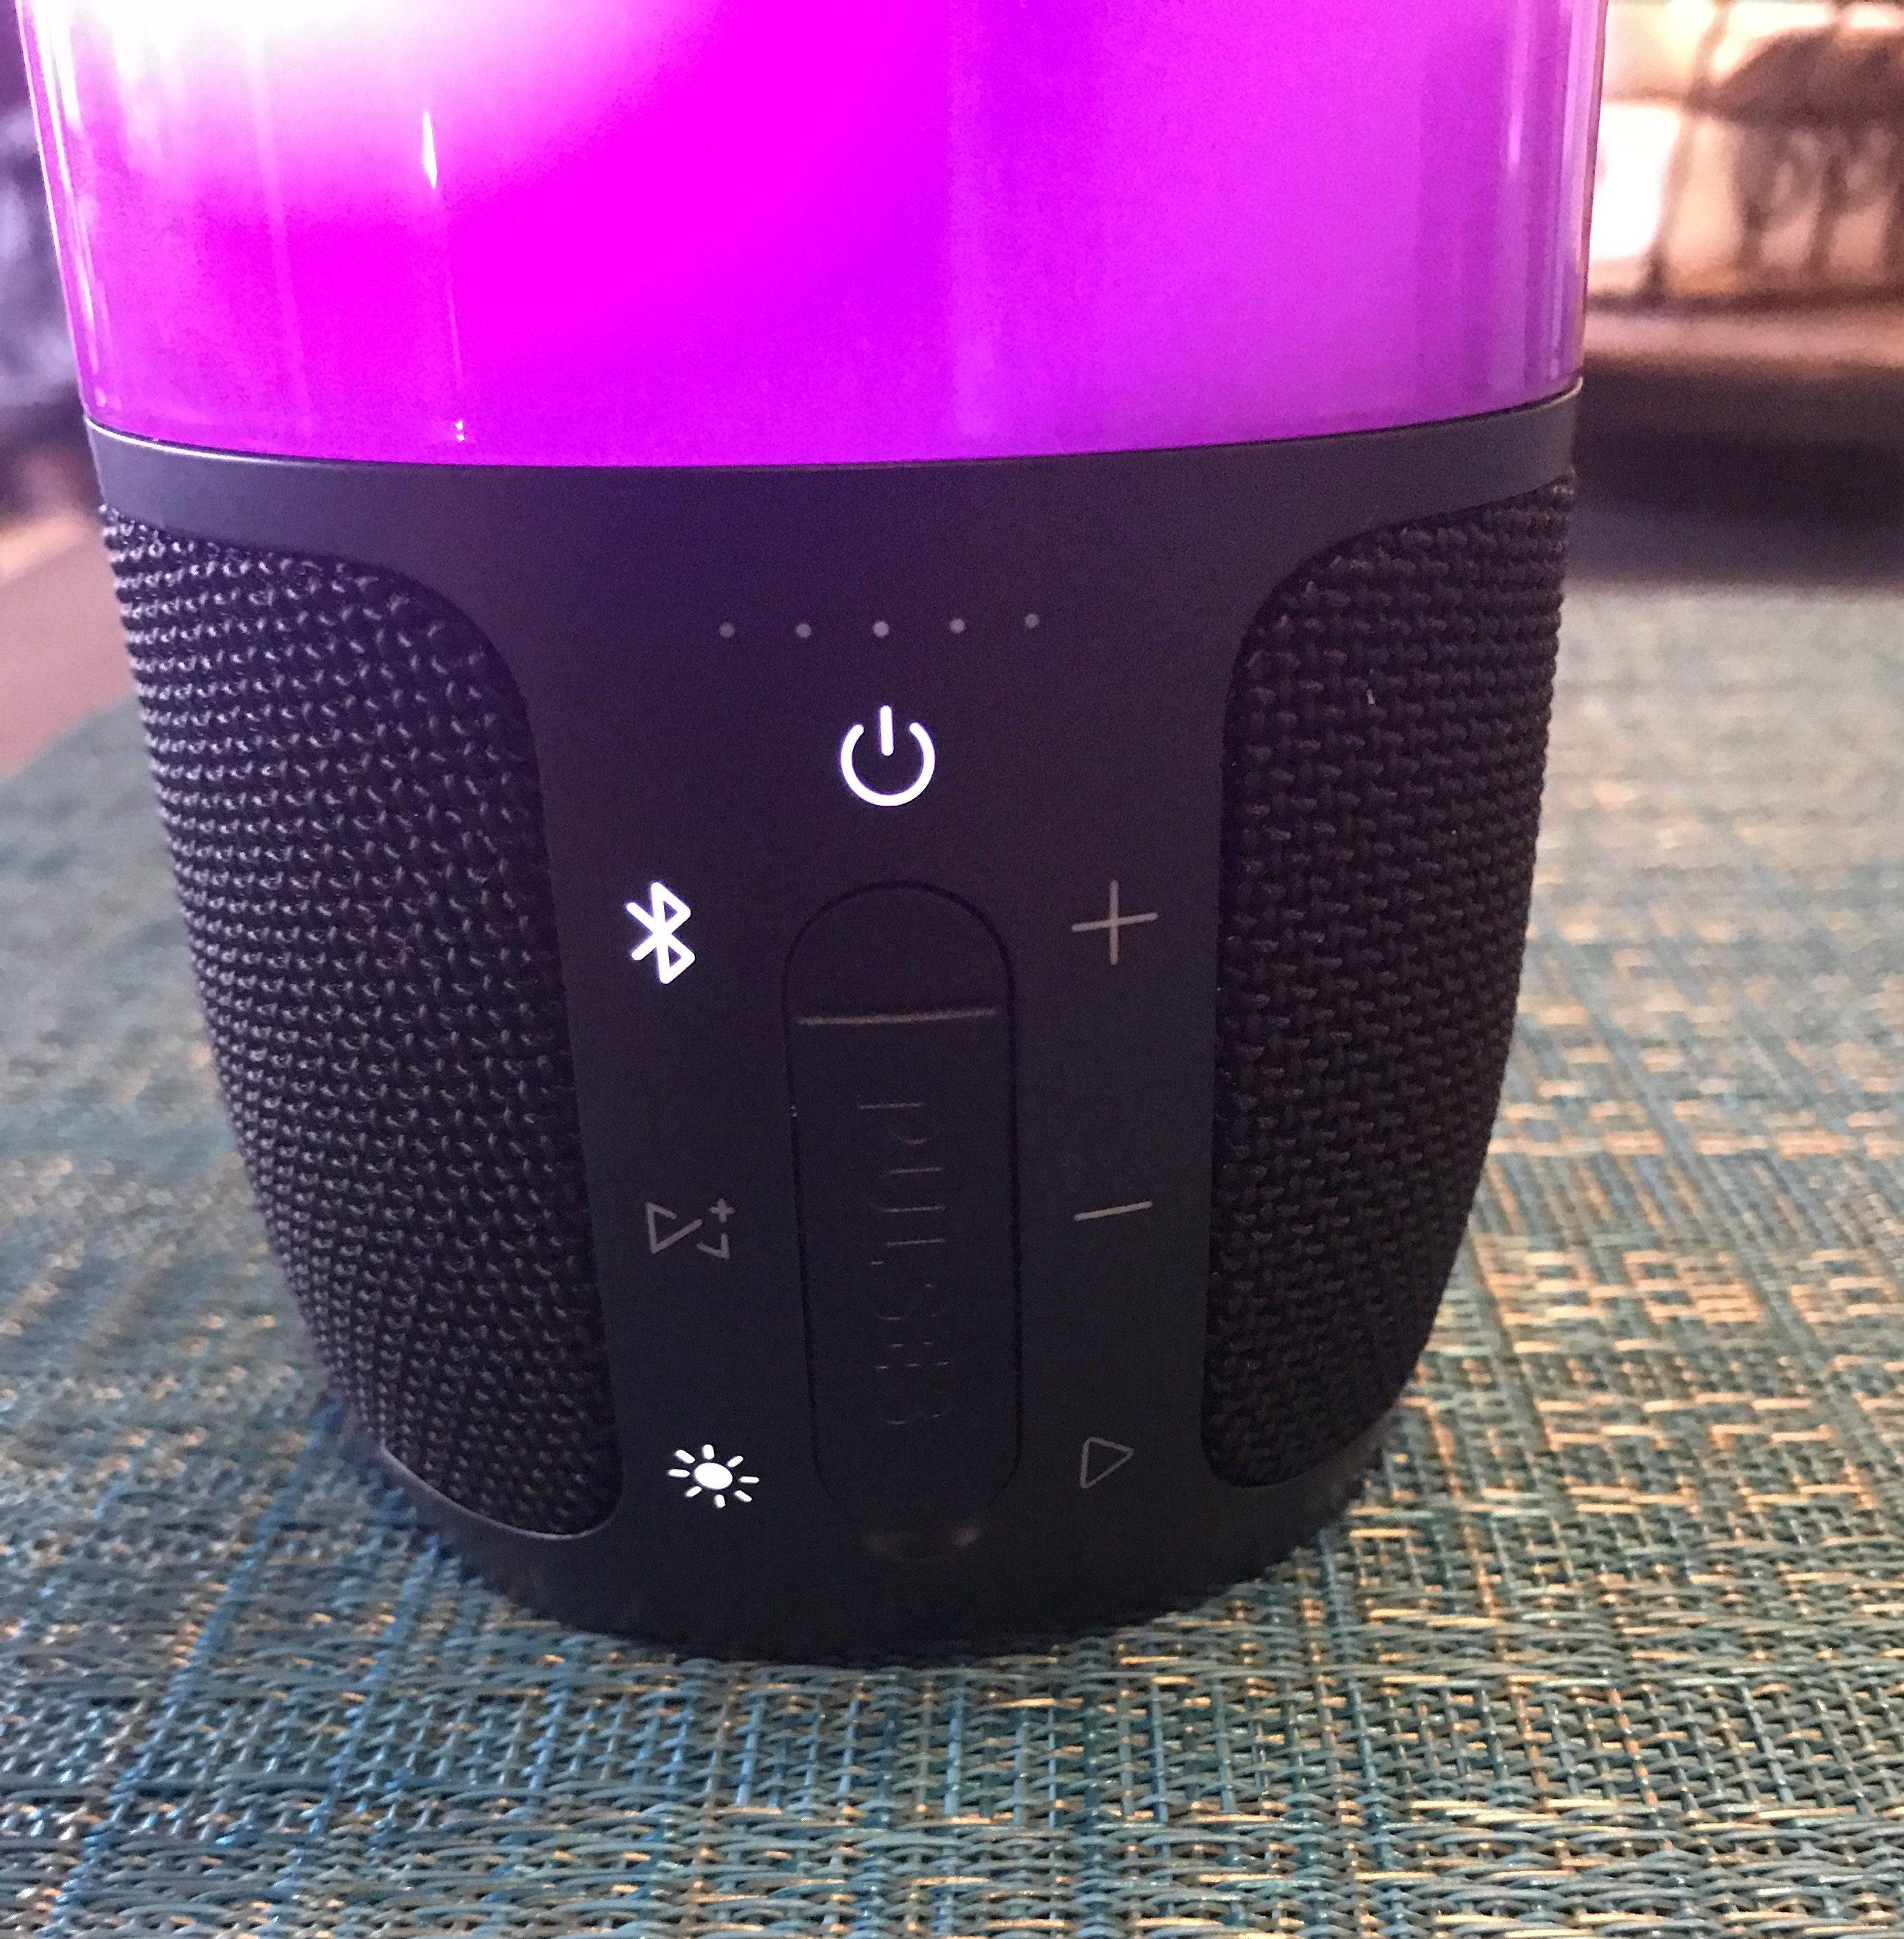 Jbl pulse 3 bluetooth speaker tech review busted wallet for Housse jbl pulse 3